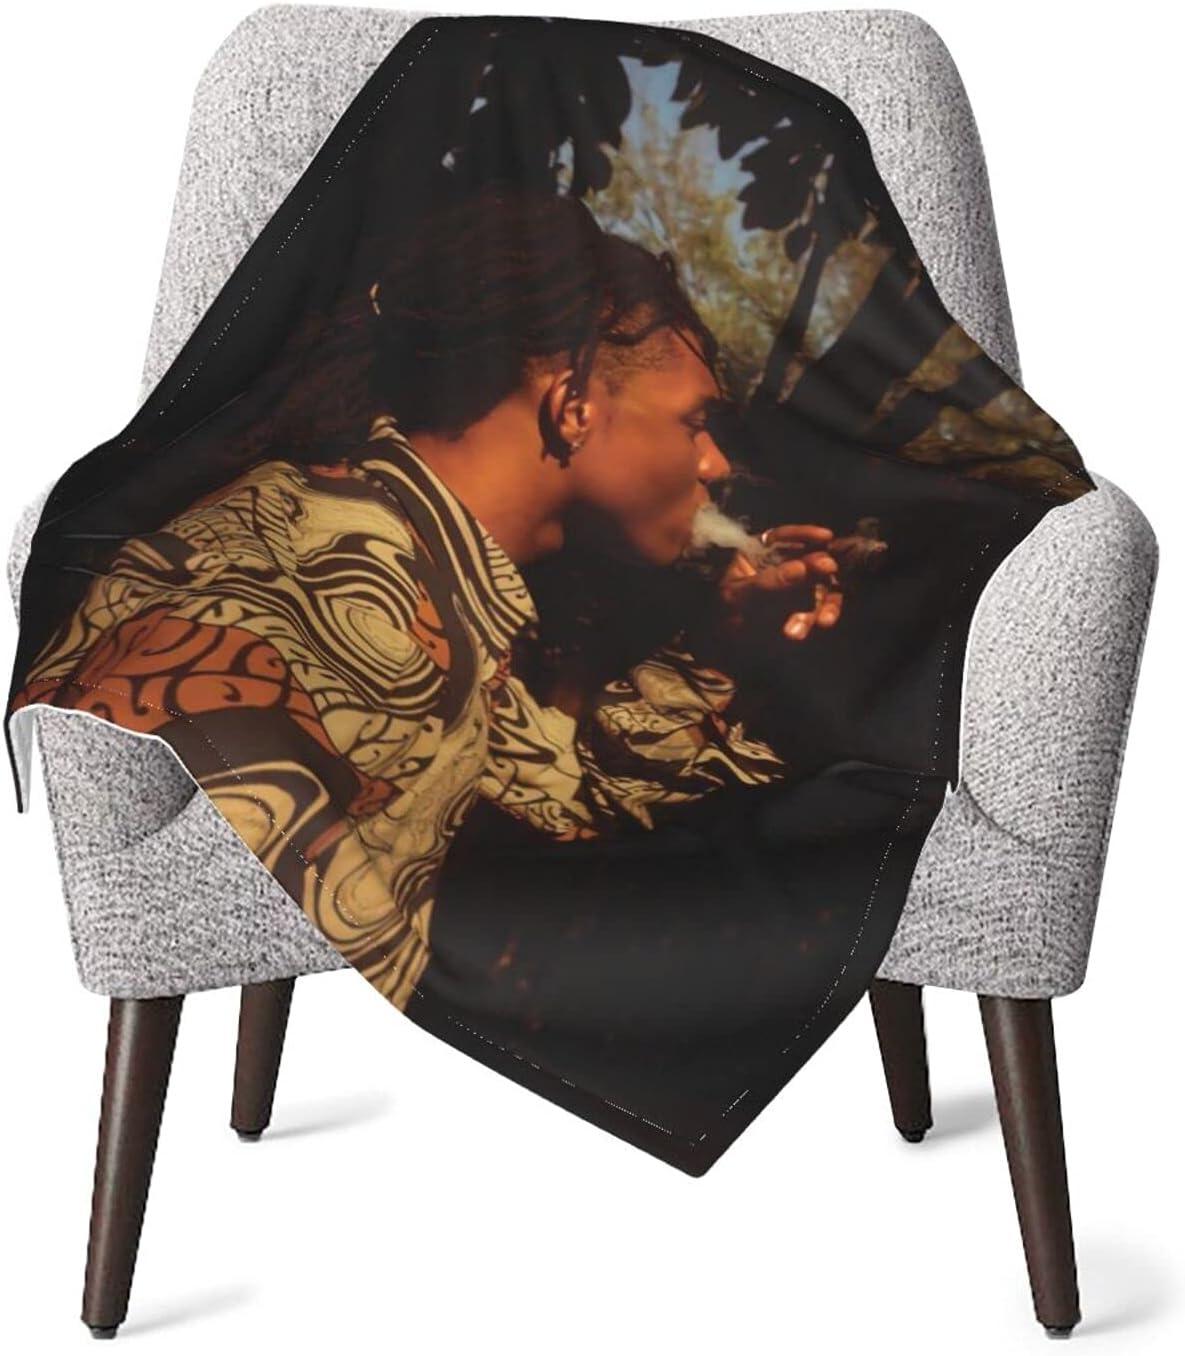 YTGBHGNJMJ SwaeLee Baby Swaddle Blanket Easy-to-use R half Swaddling Wrap Infant